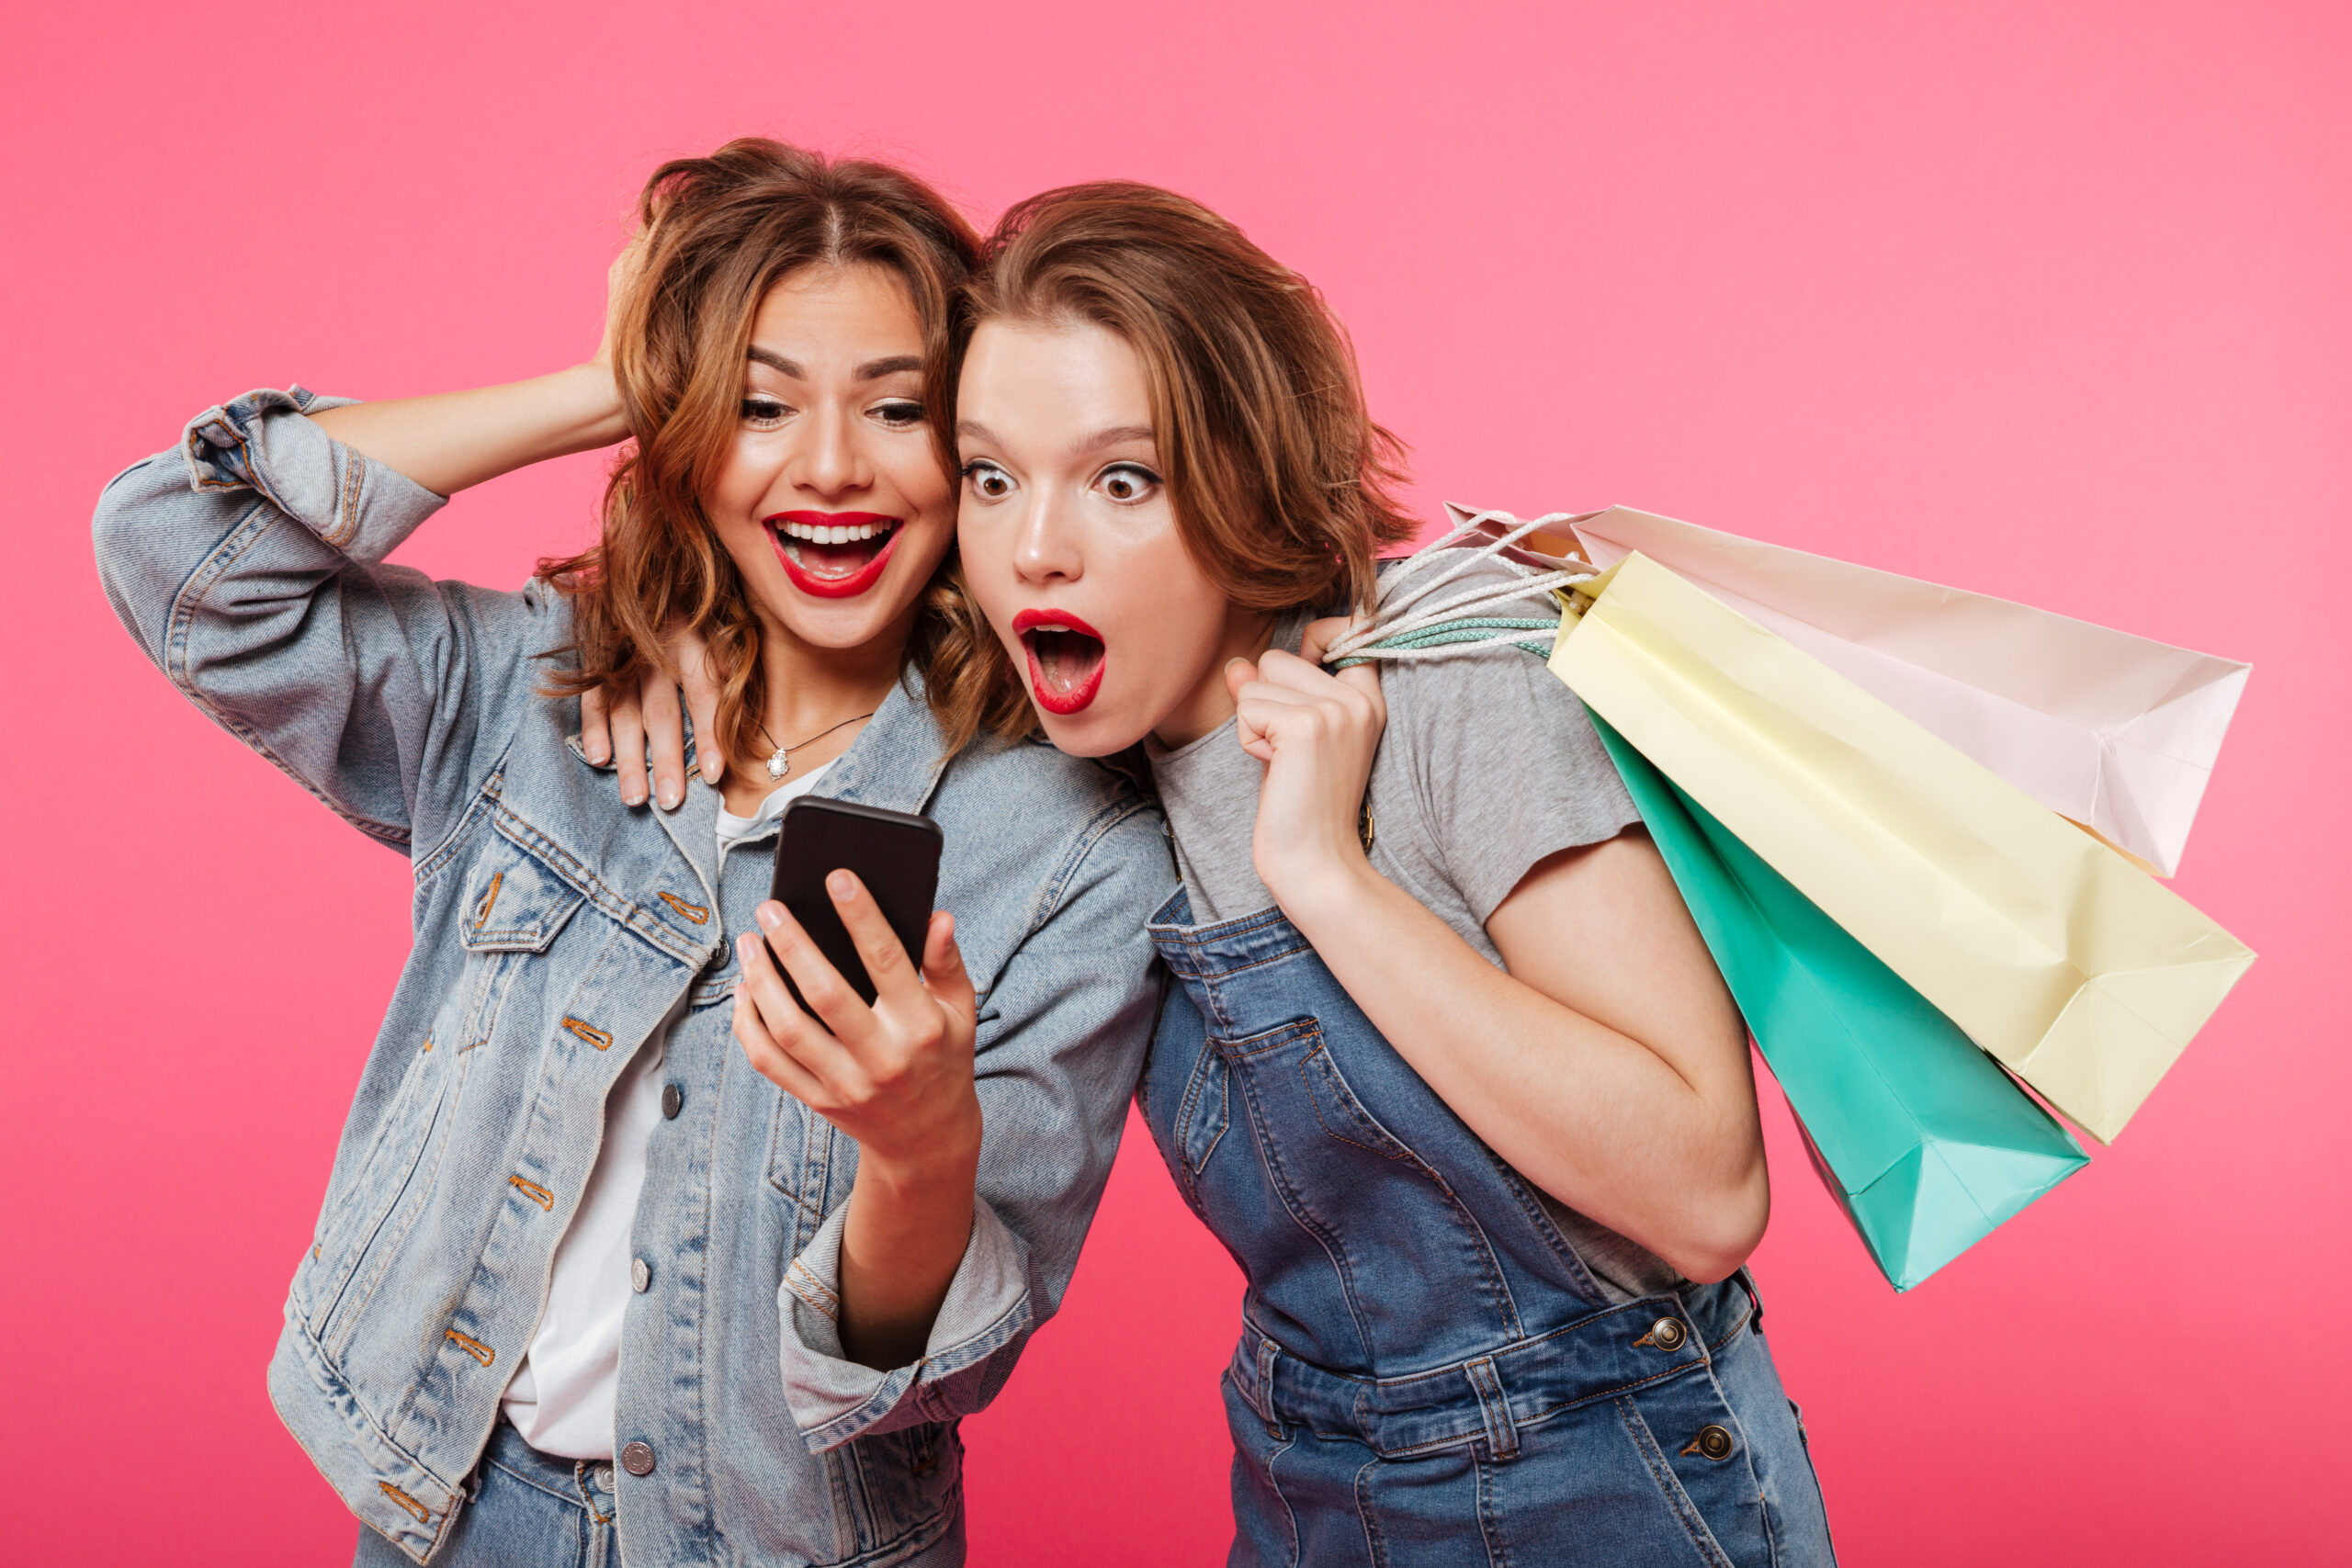 Psychological Factors That Affect Online Shopping